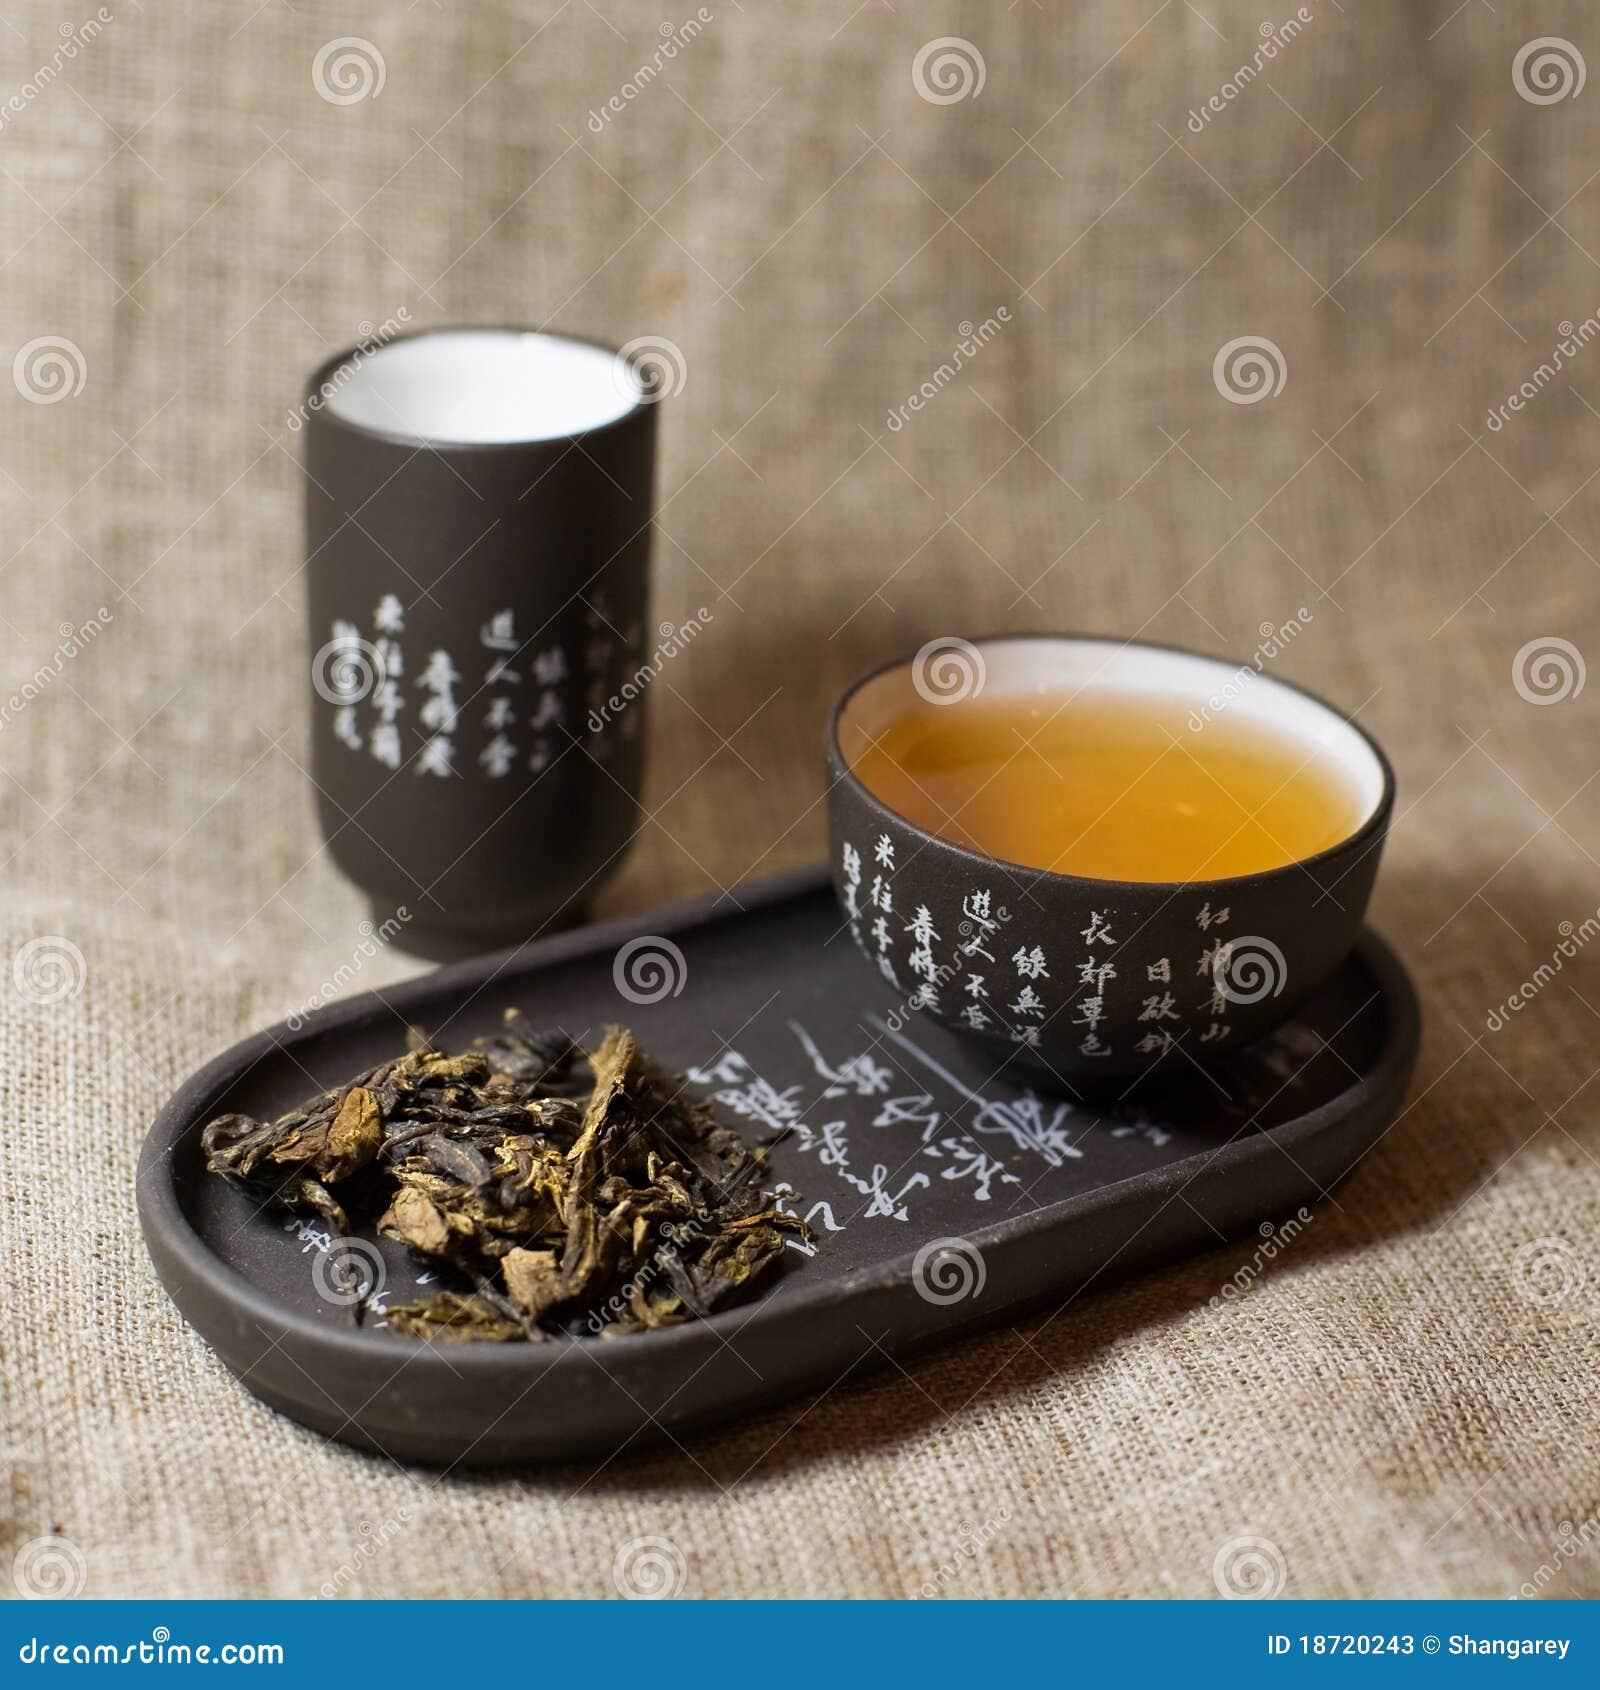 Green tea in ware